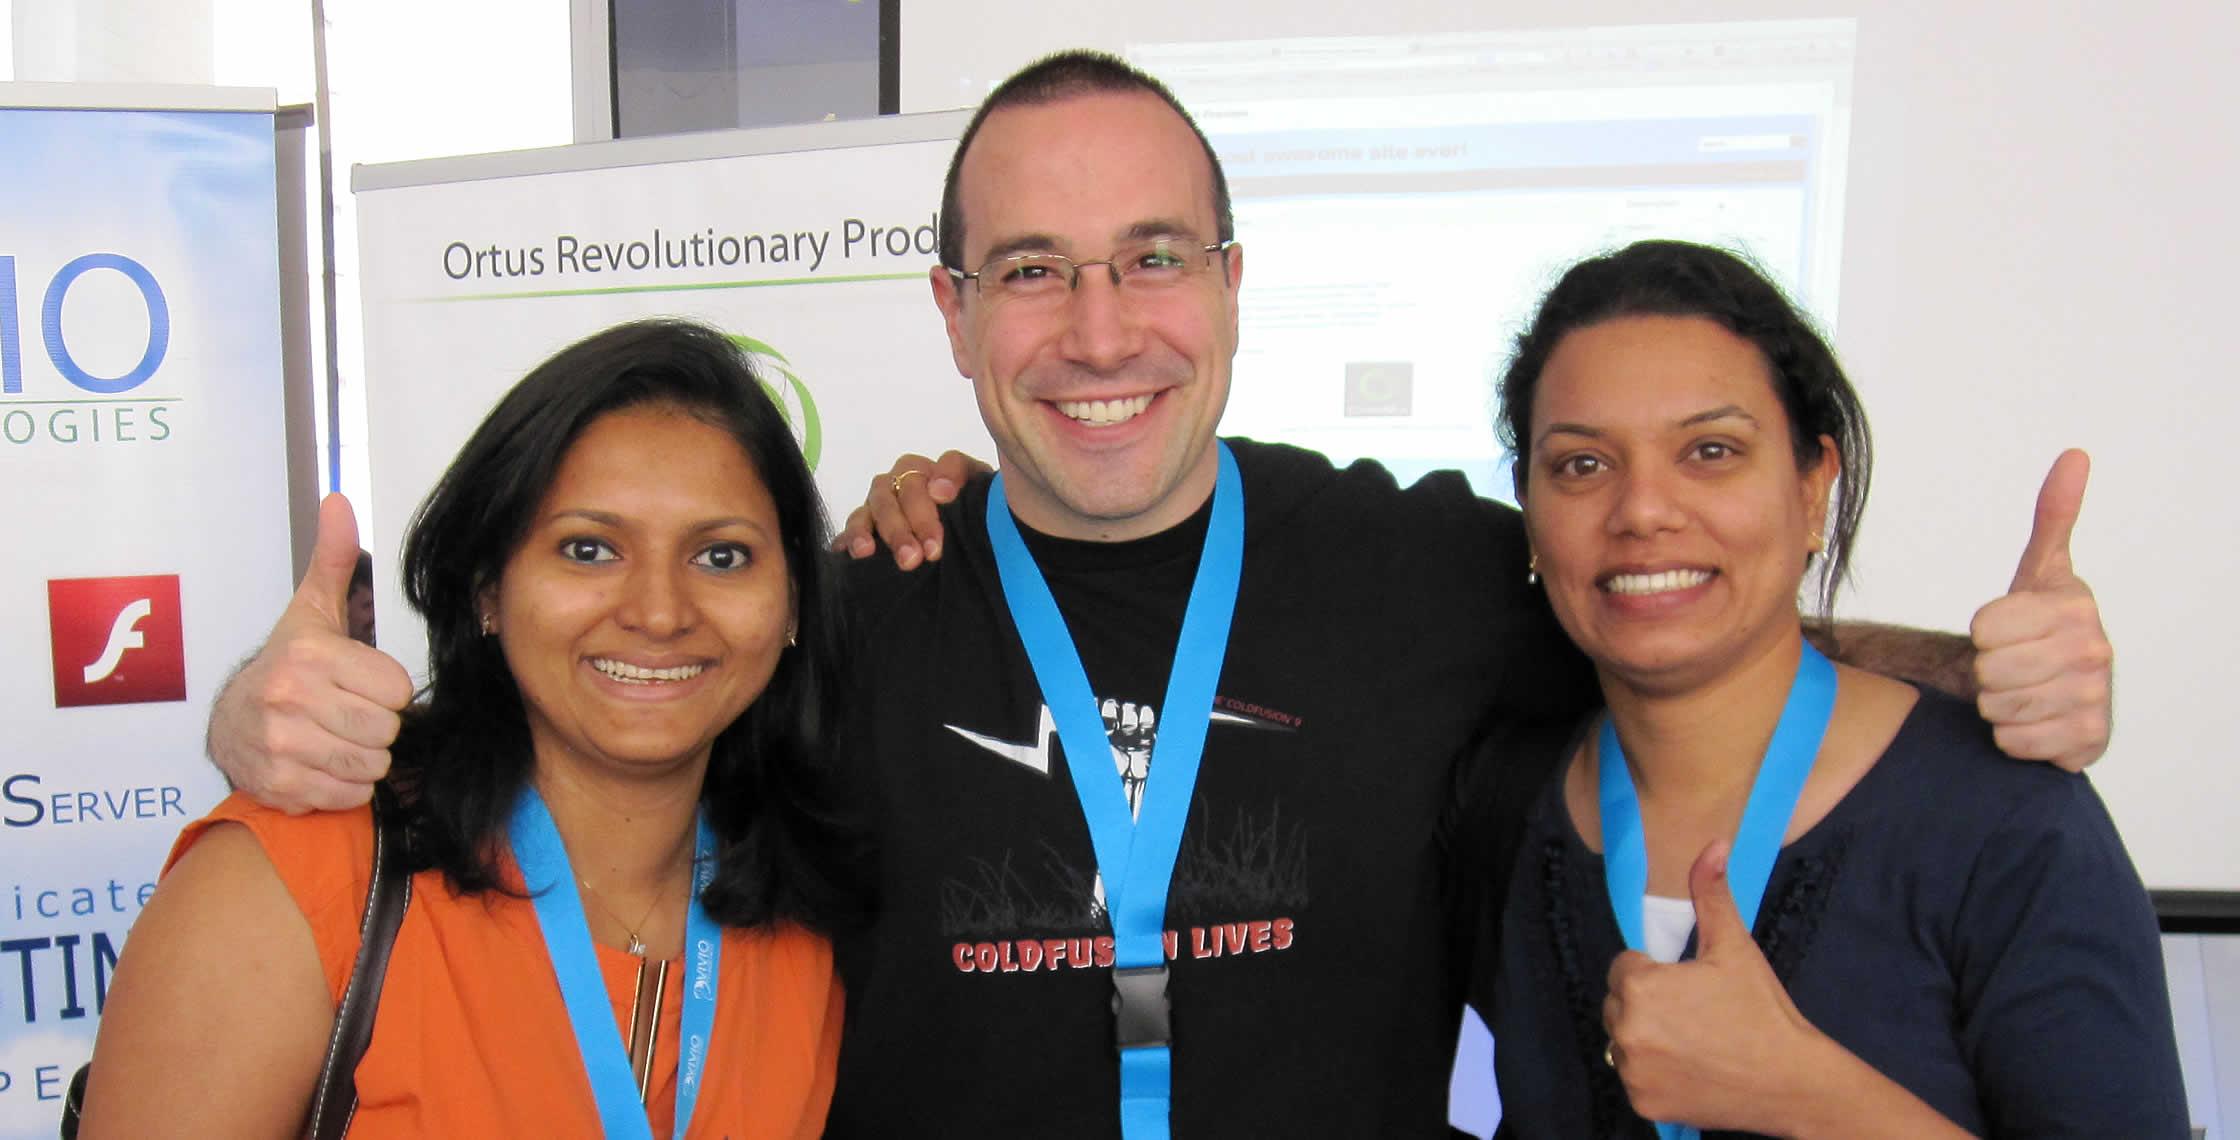 Ben Nadel at cf.Objective() 2013 (Bloomington, MN) with: Loveena Dsouza and Ritika Chowdhary